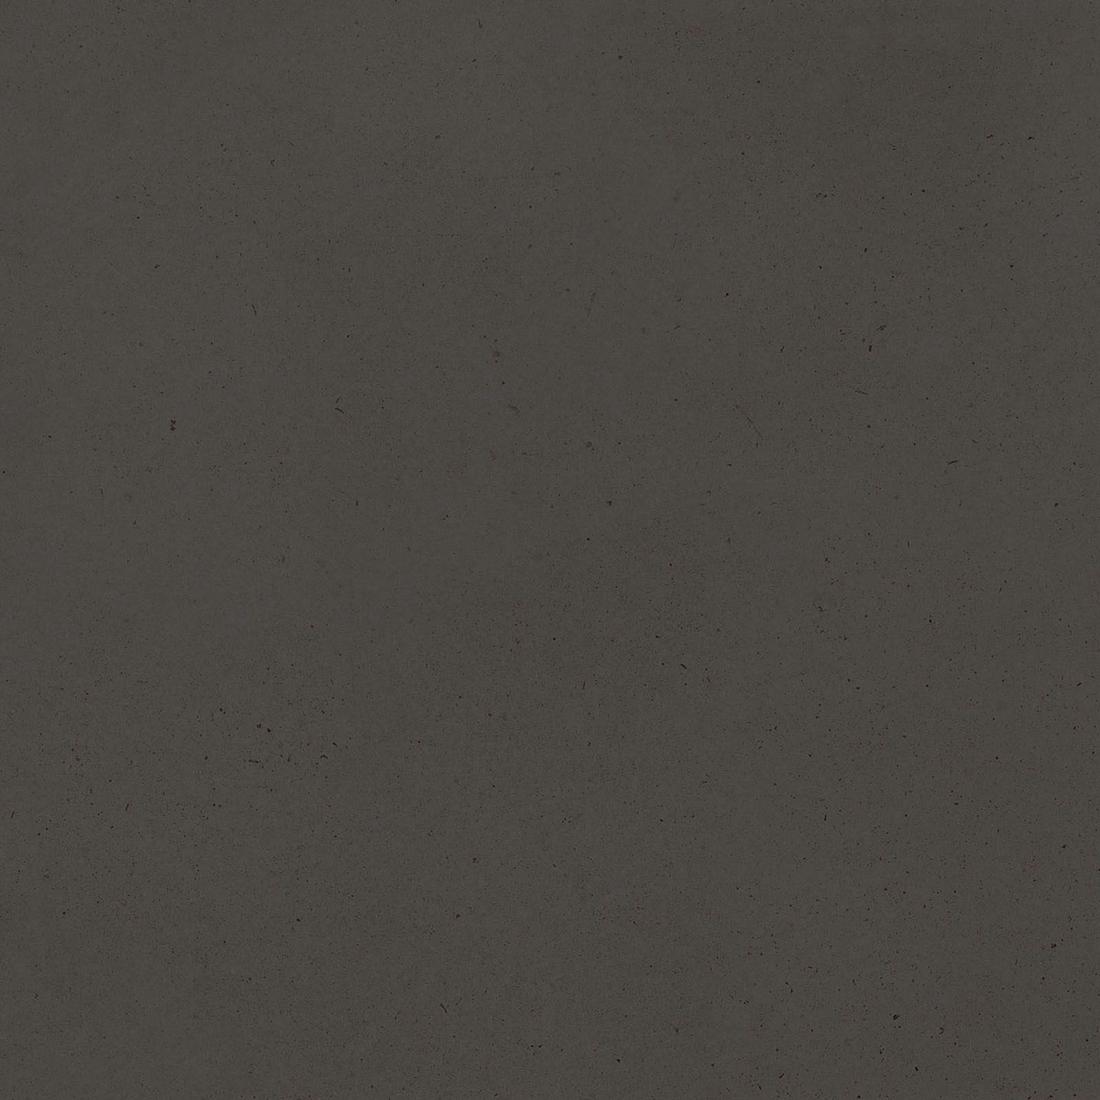 Picture of Palomastone Graphite 120X120cm rec.